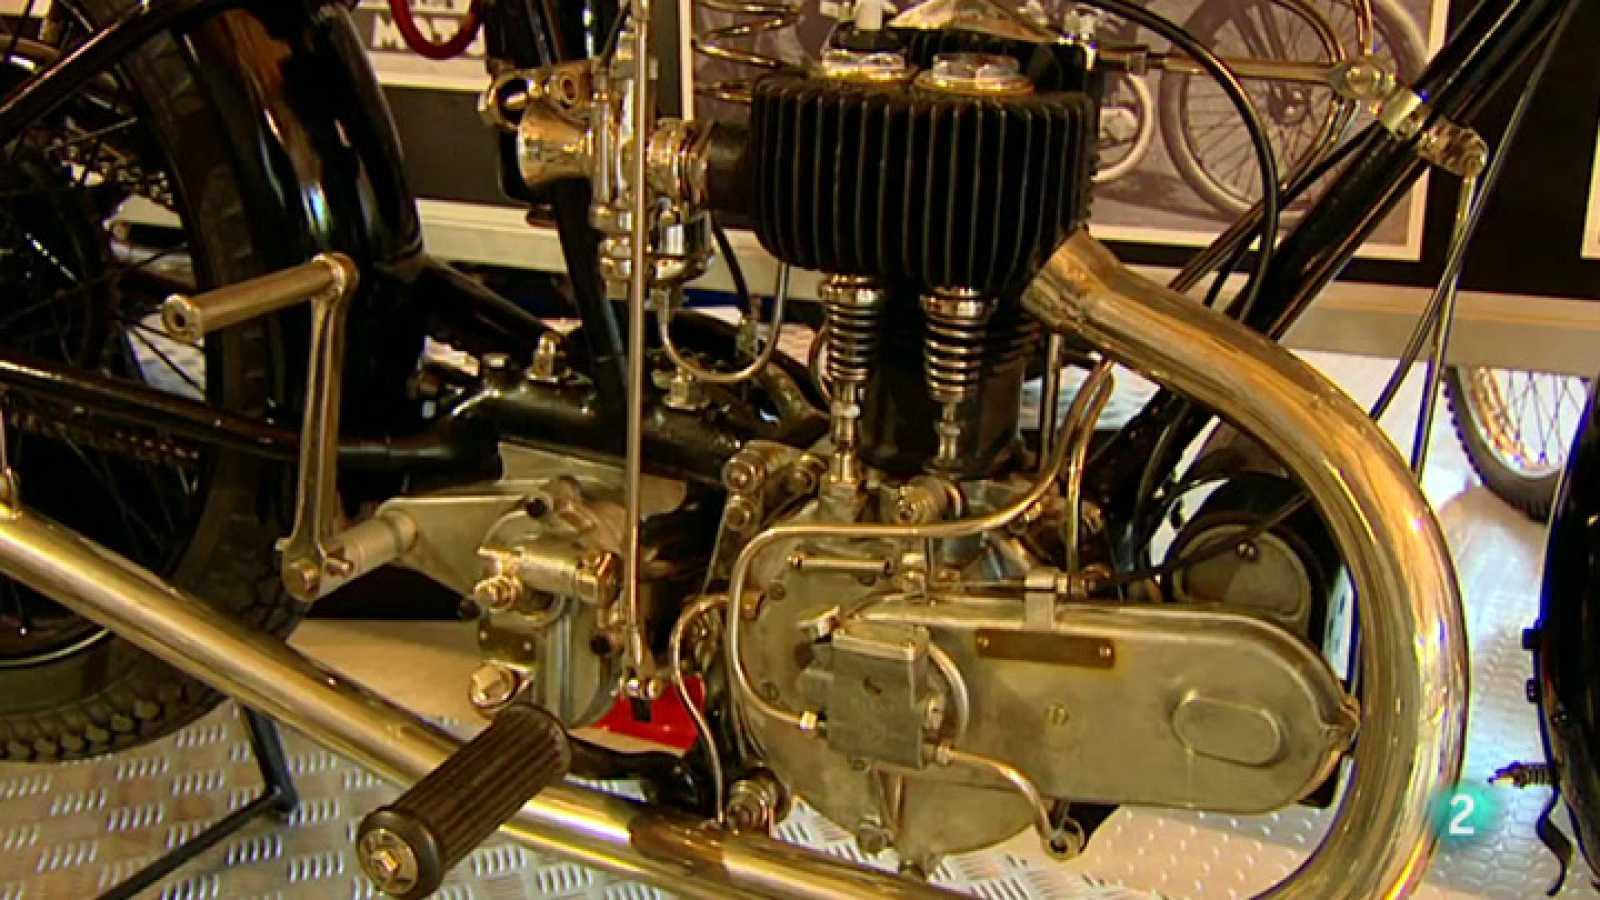 De Museus - Museu de la moto de Basella